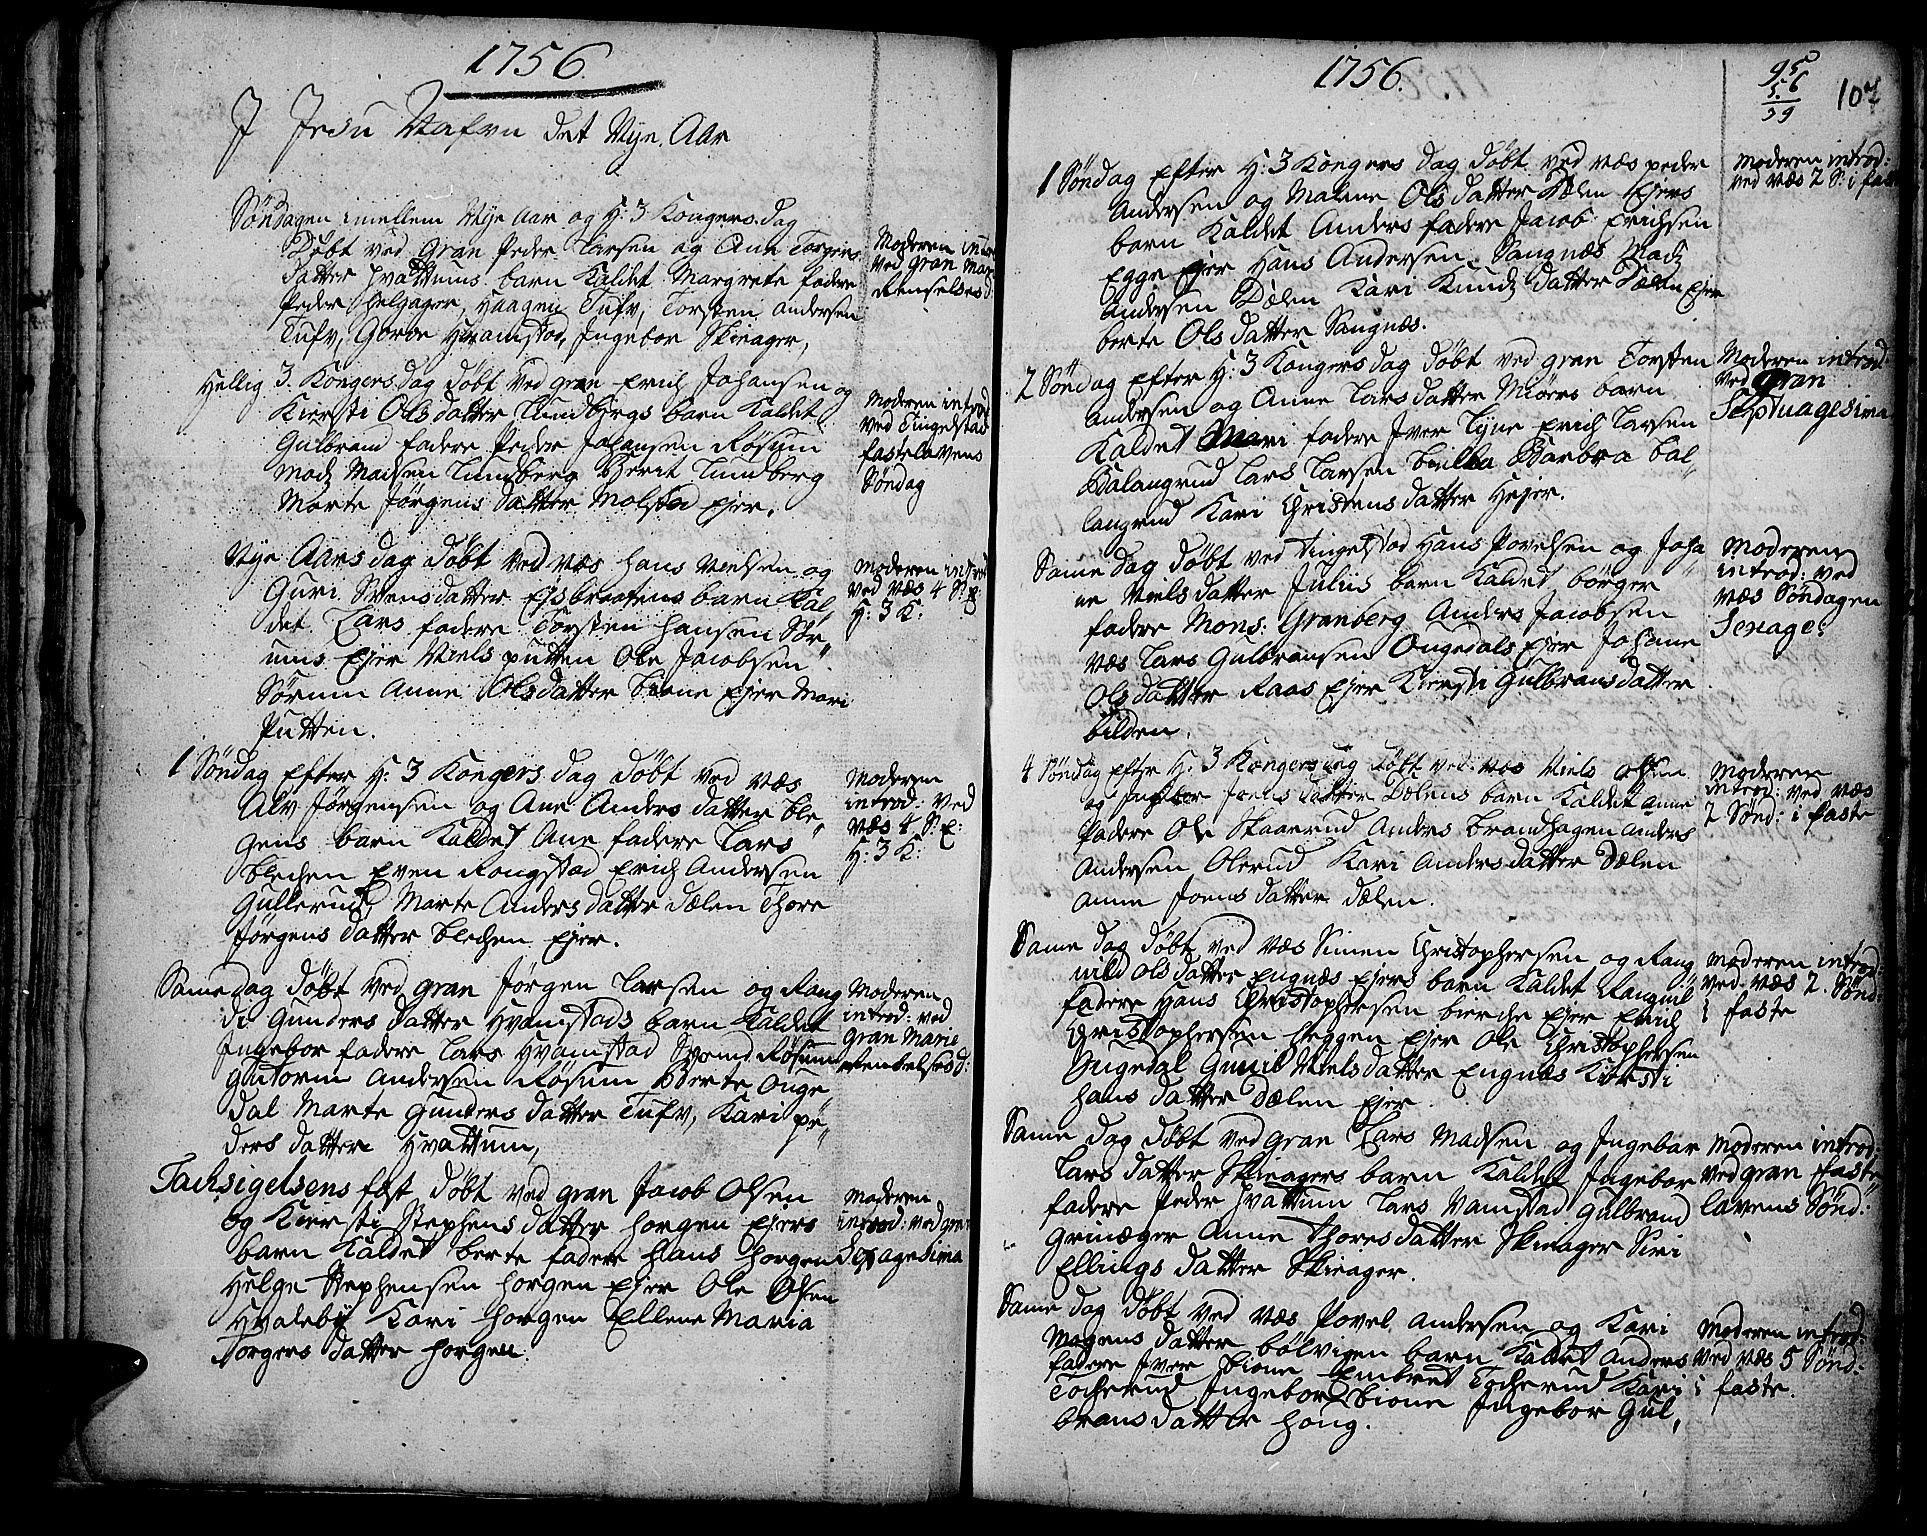 SAH, Gran prestekontor, Ministerialbok nr. 3, 1745-1758, s. 107